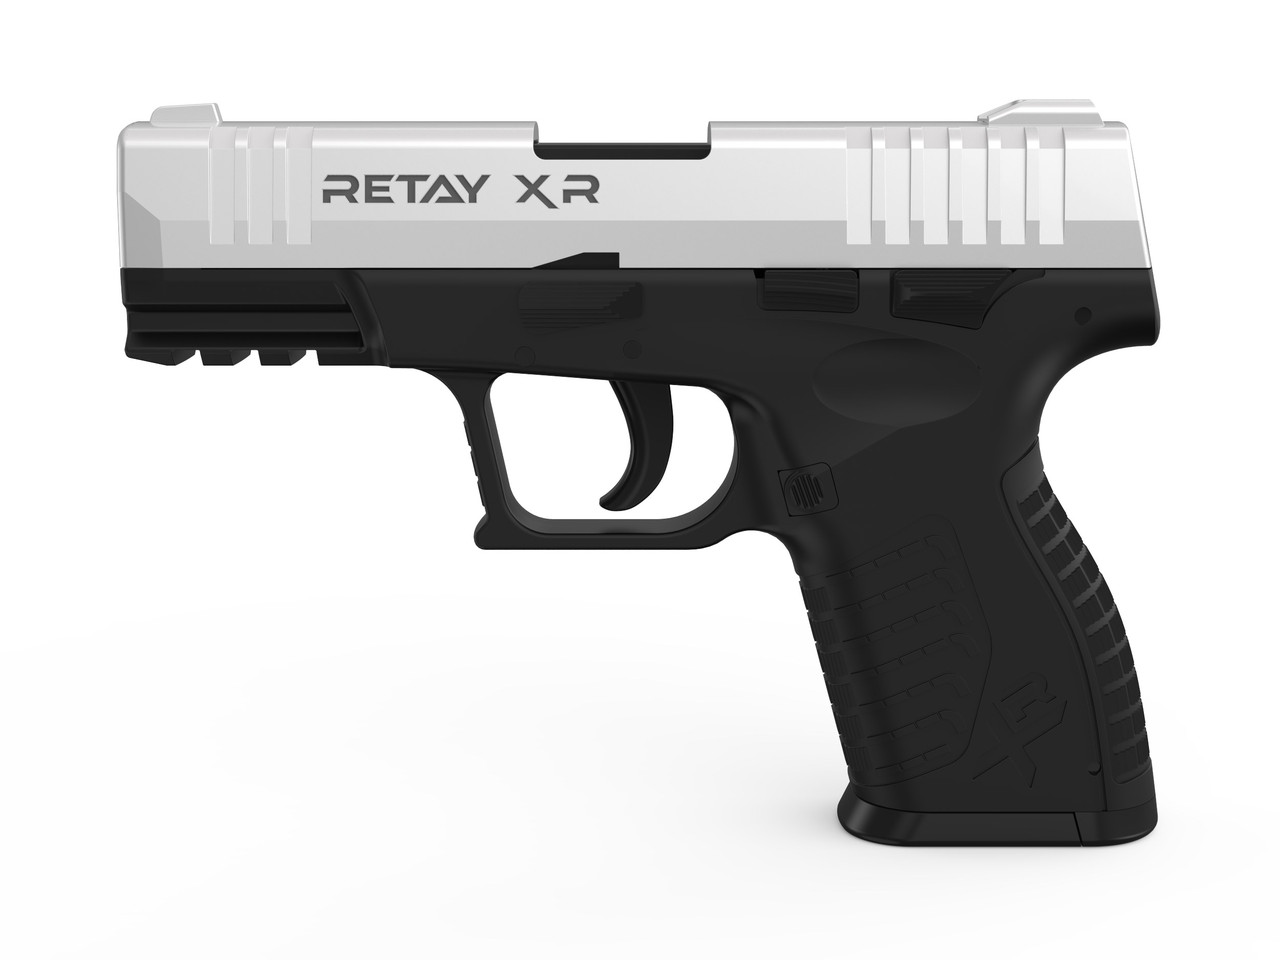 Пистолет стартовый  Retay XR, 9мм. Цвет - Chrome